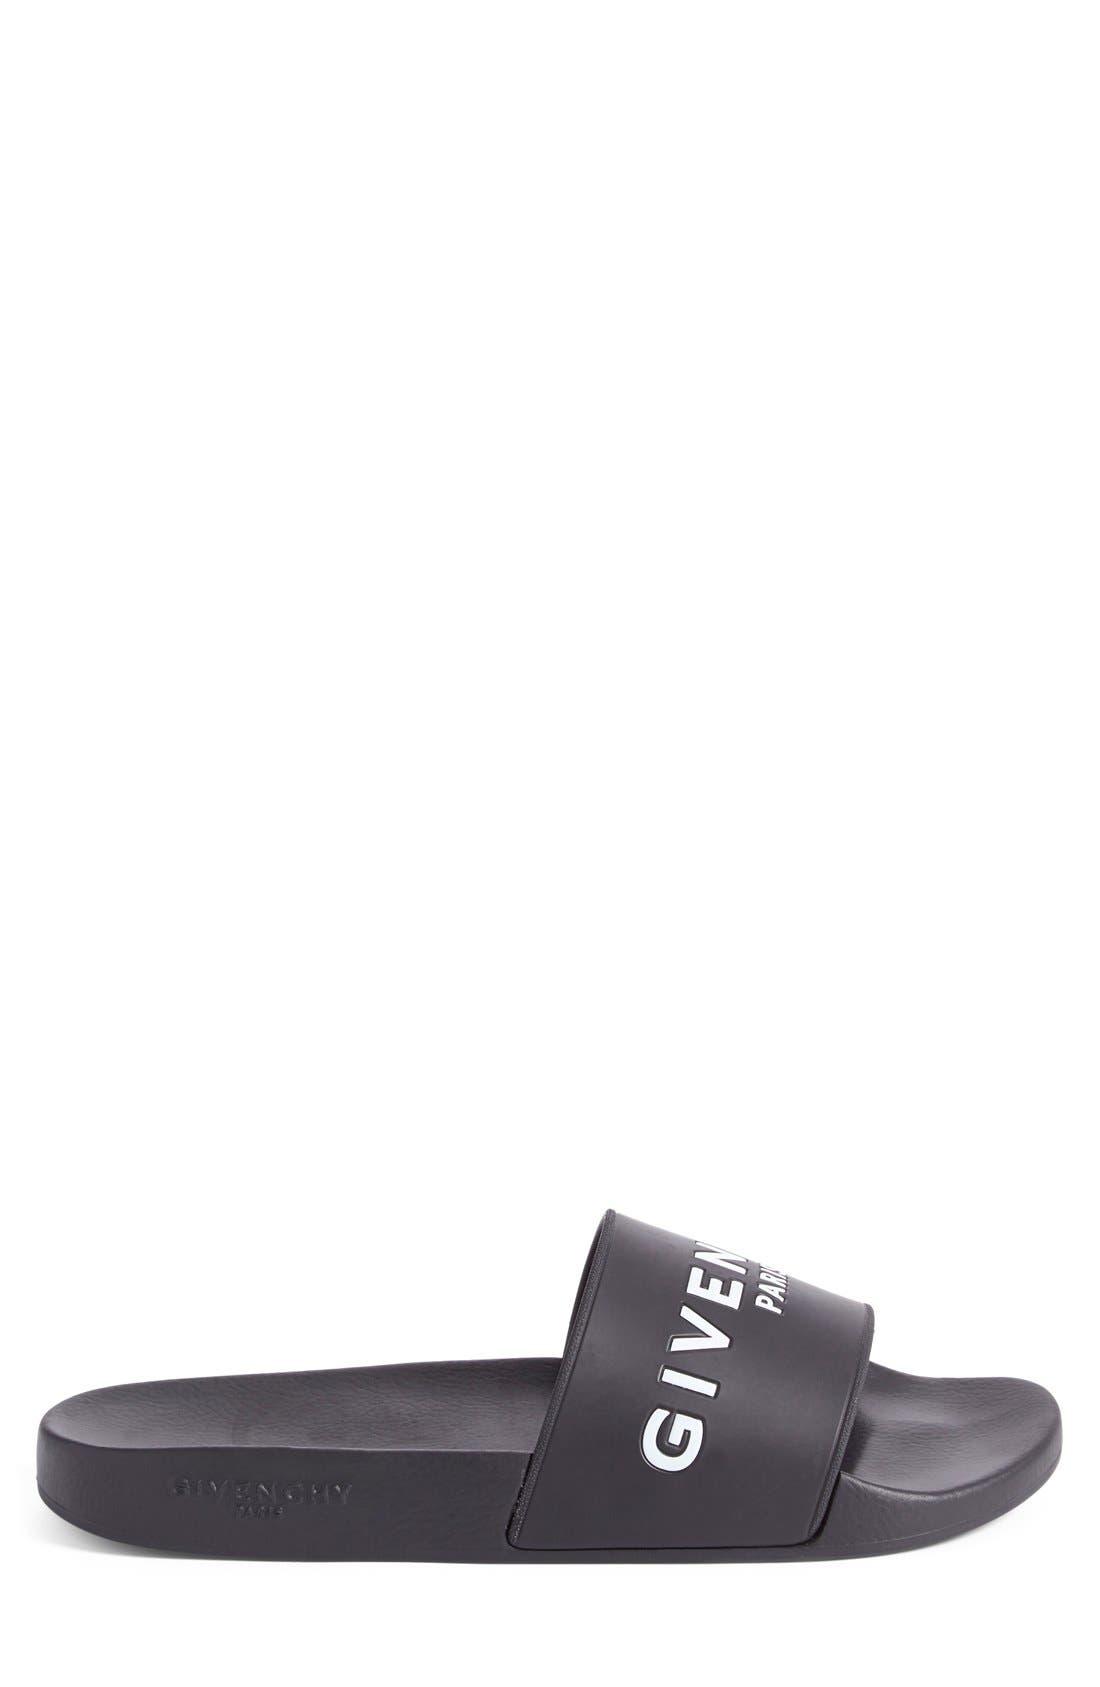 Slide Sandal,                             Alternate thumbnail 4, color,                             Black Leather